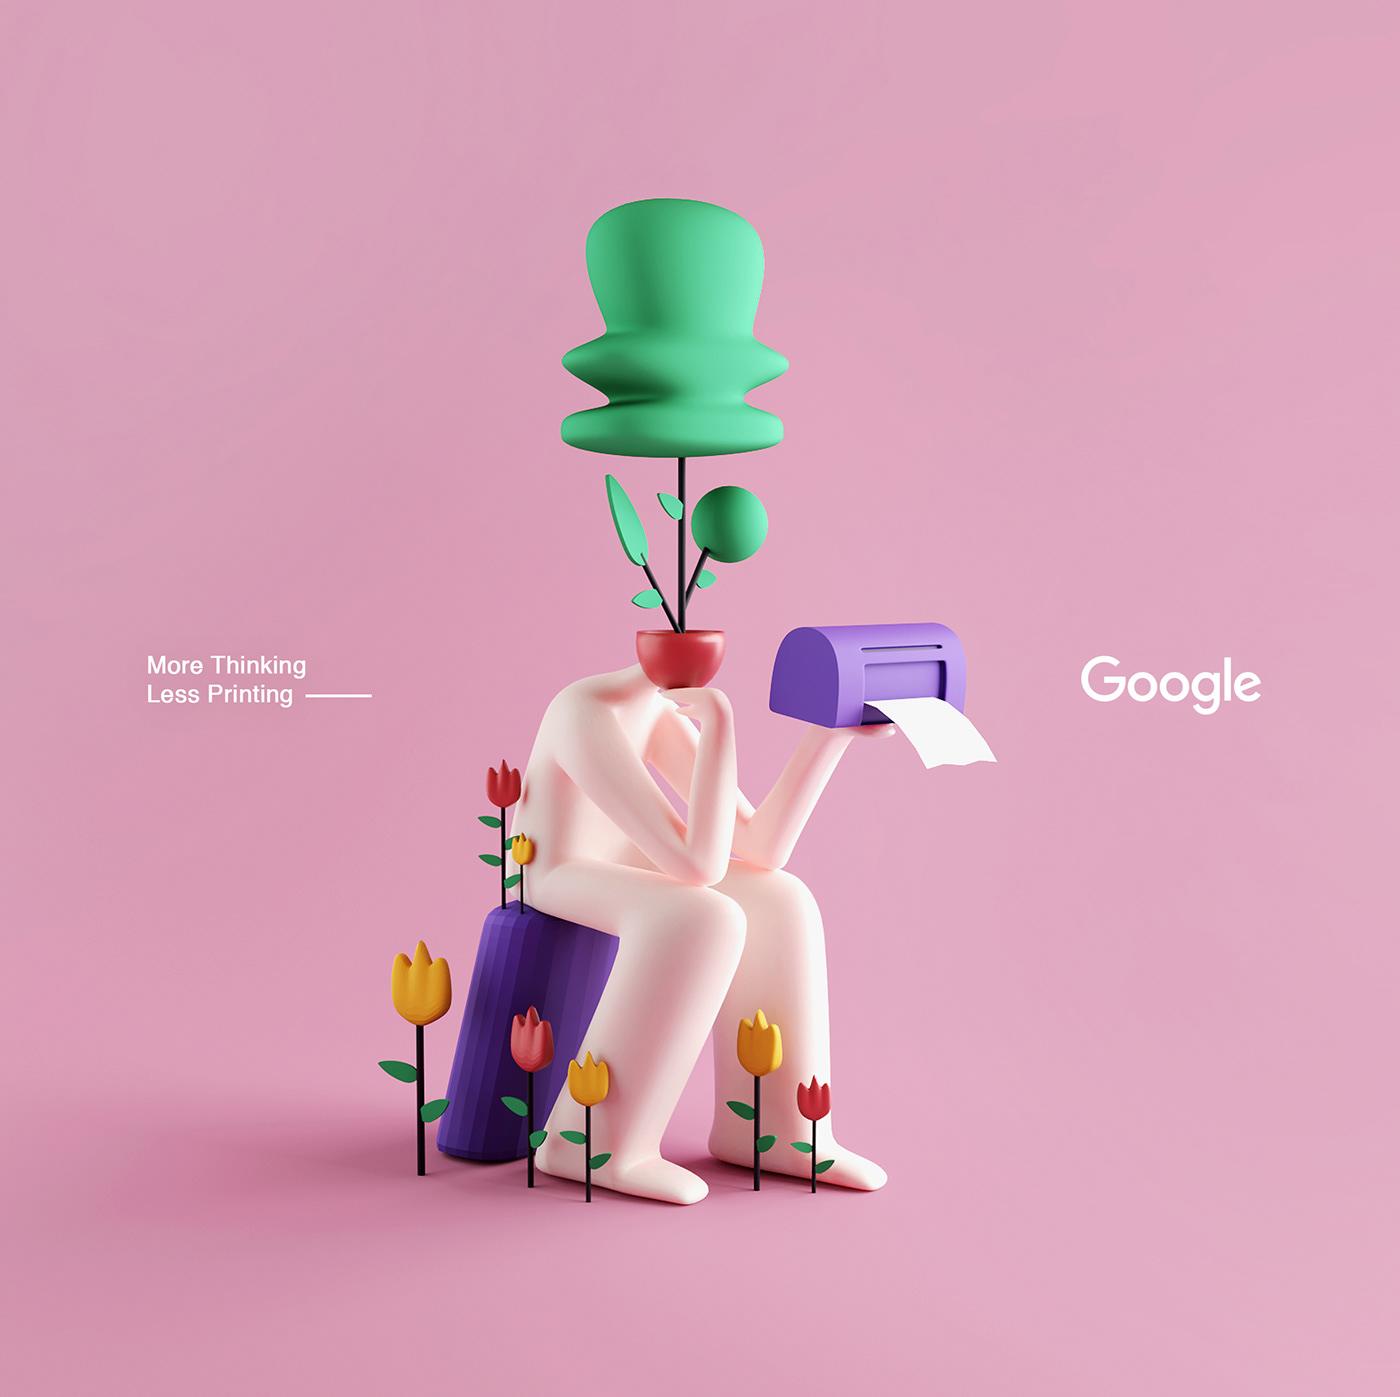 google sticker cinema4d Character design inspiration adobe ILLUSTRATION  creative octane